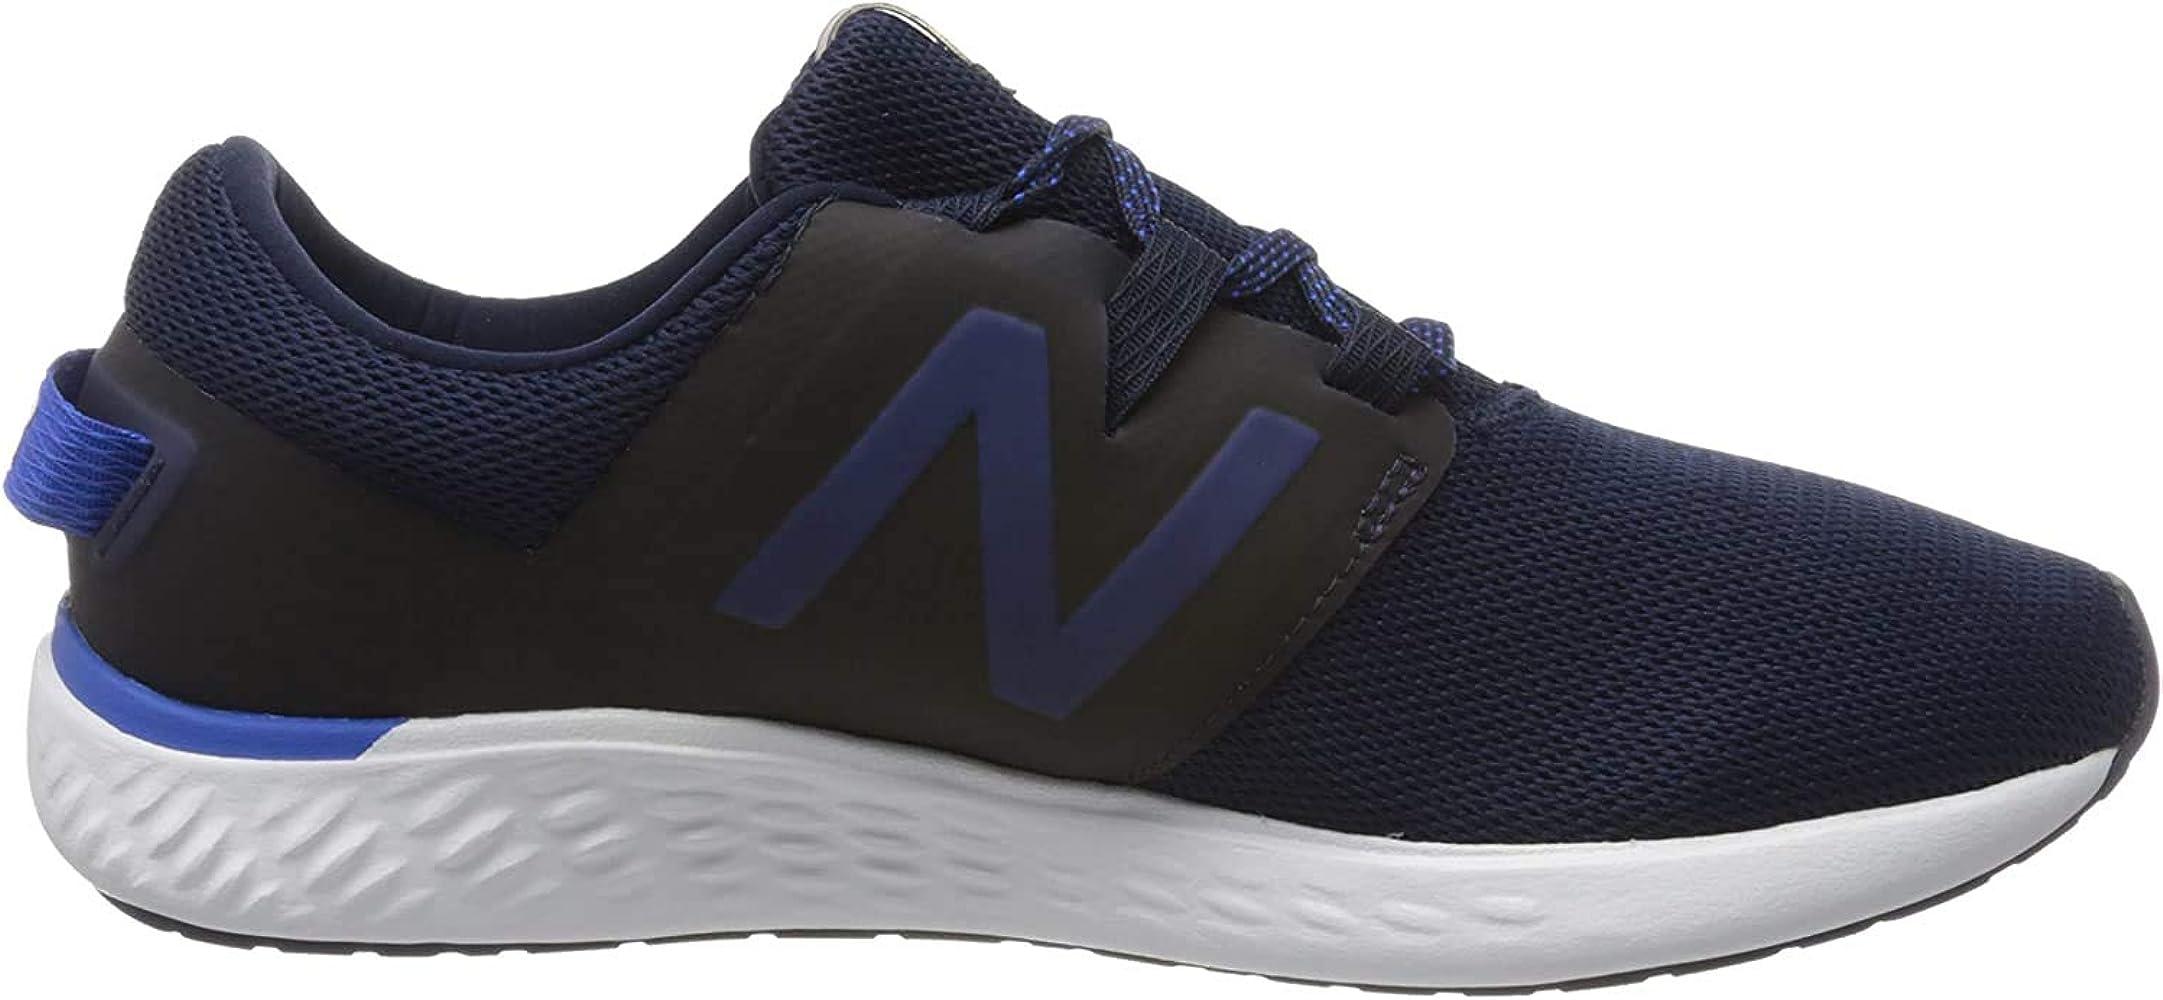 Amazon.com | New Balance Men's Running Shoes, Blue Navy Navy, 47.5 ...